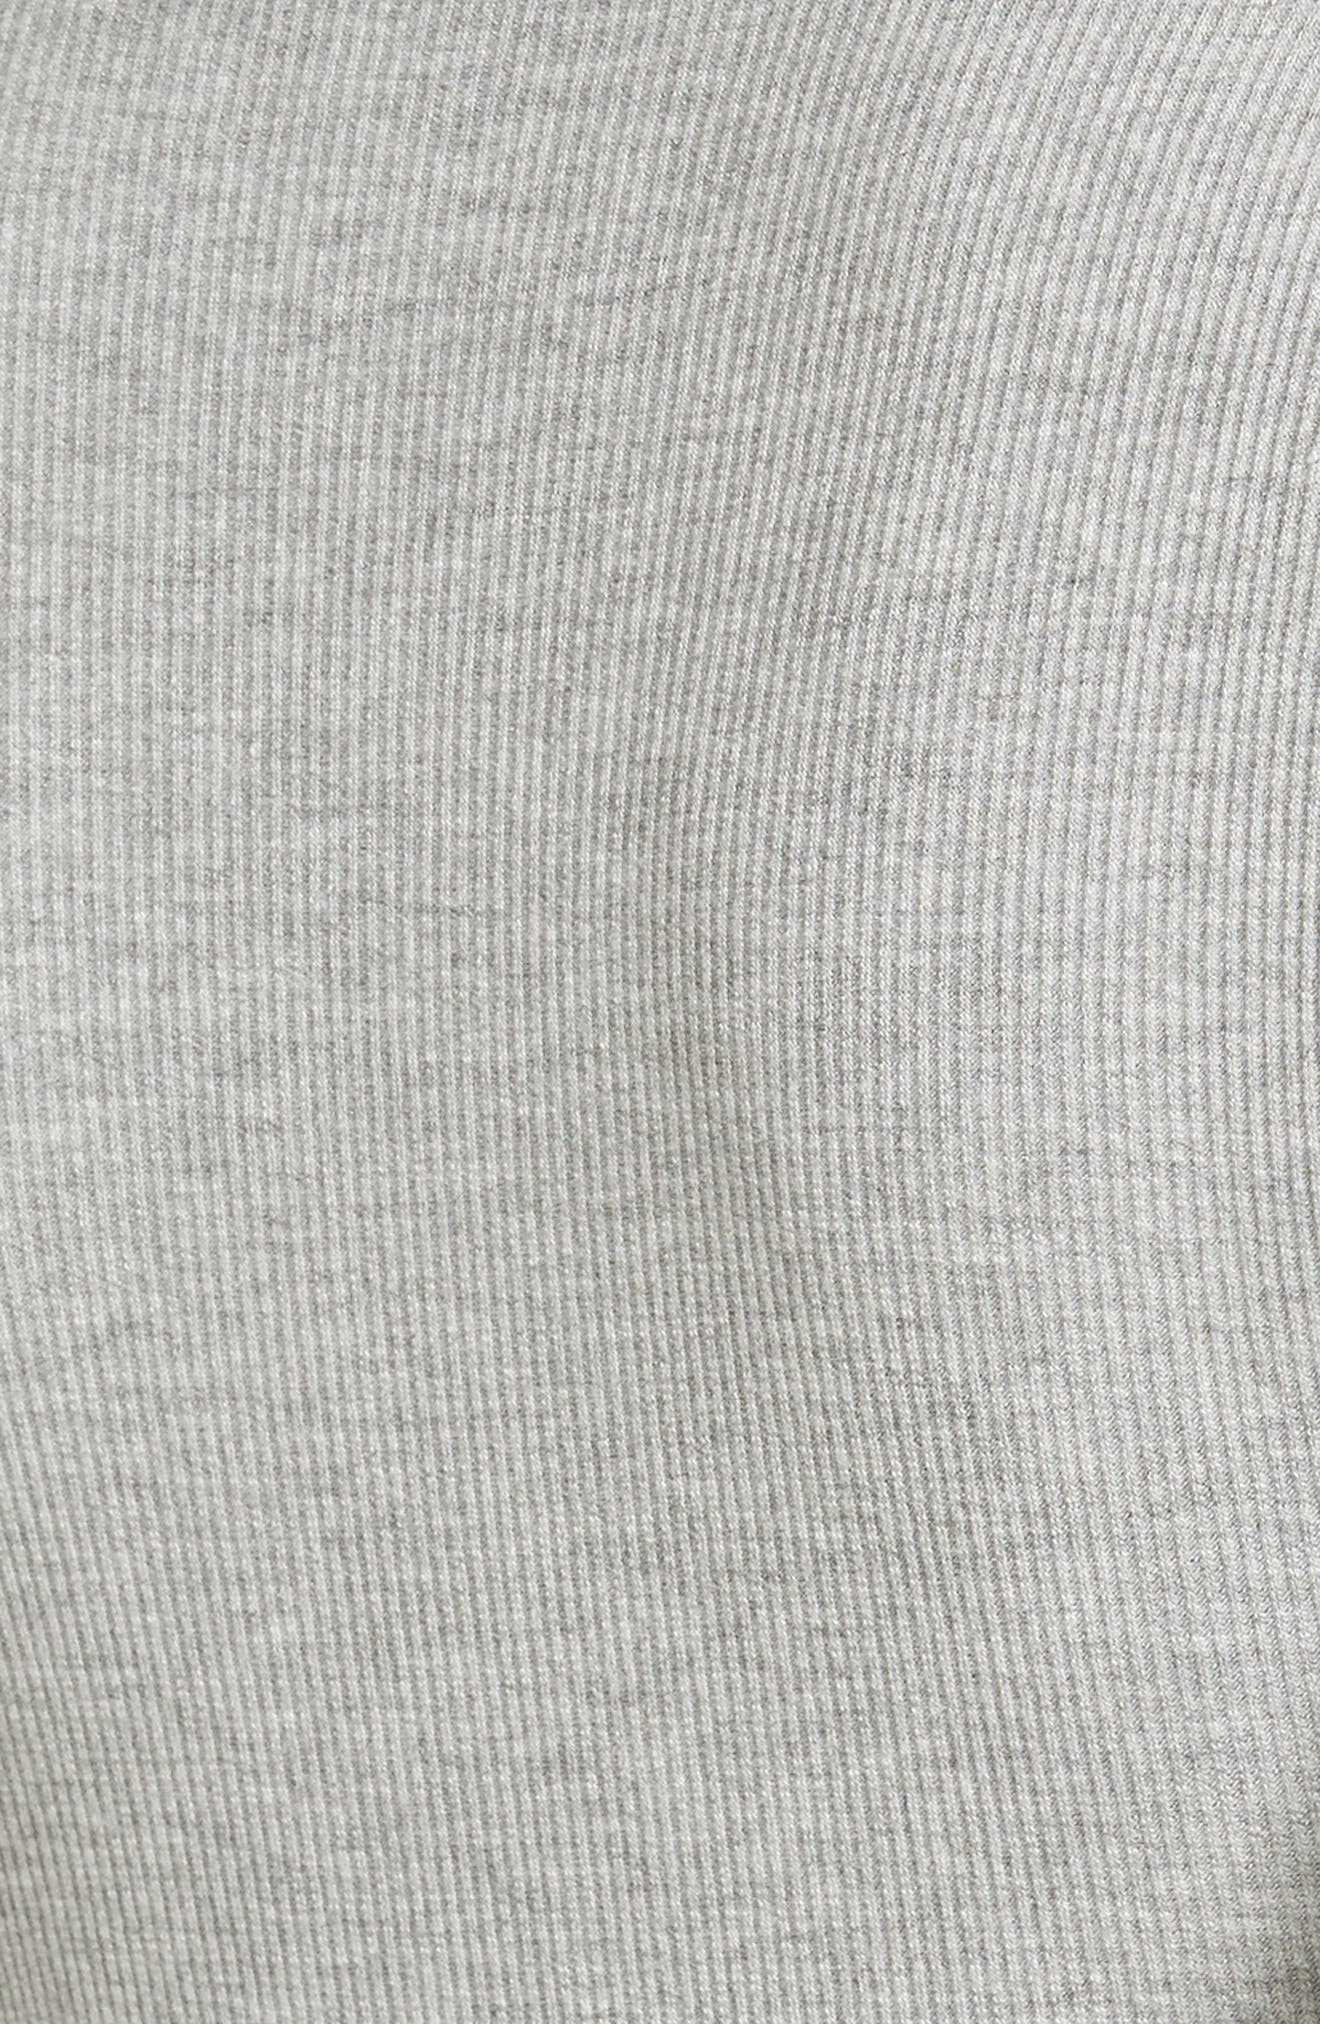 Elbow Sleeve Bodysuit,                             Alternate thumbnail 5, color,                             061